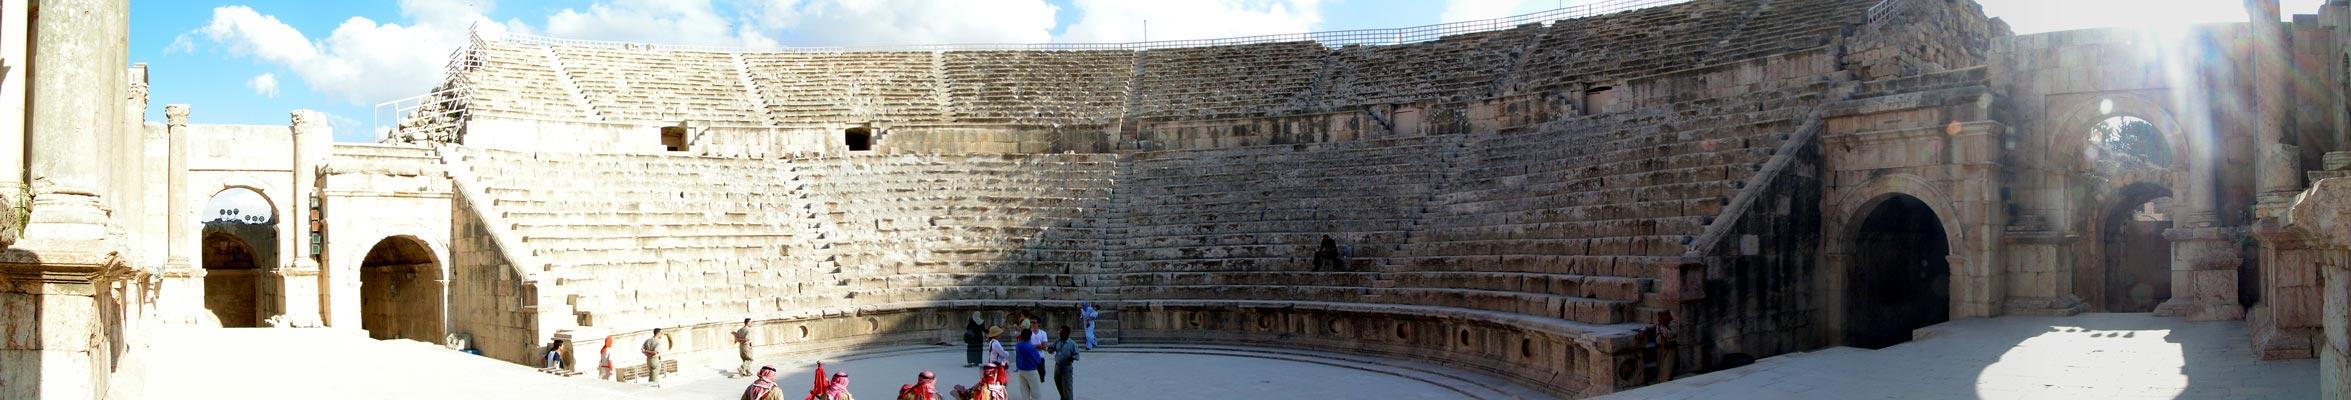 Panoráma Jerash